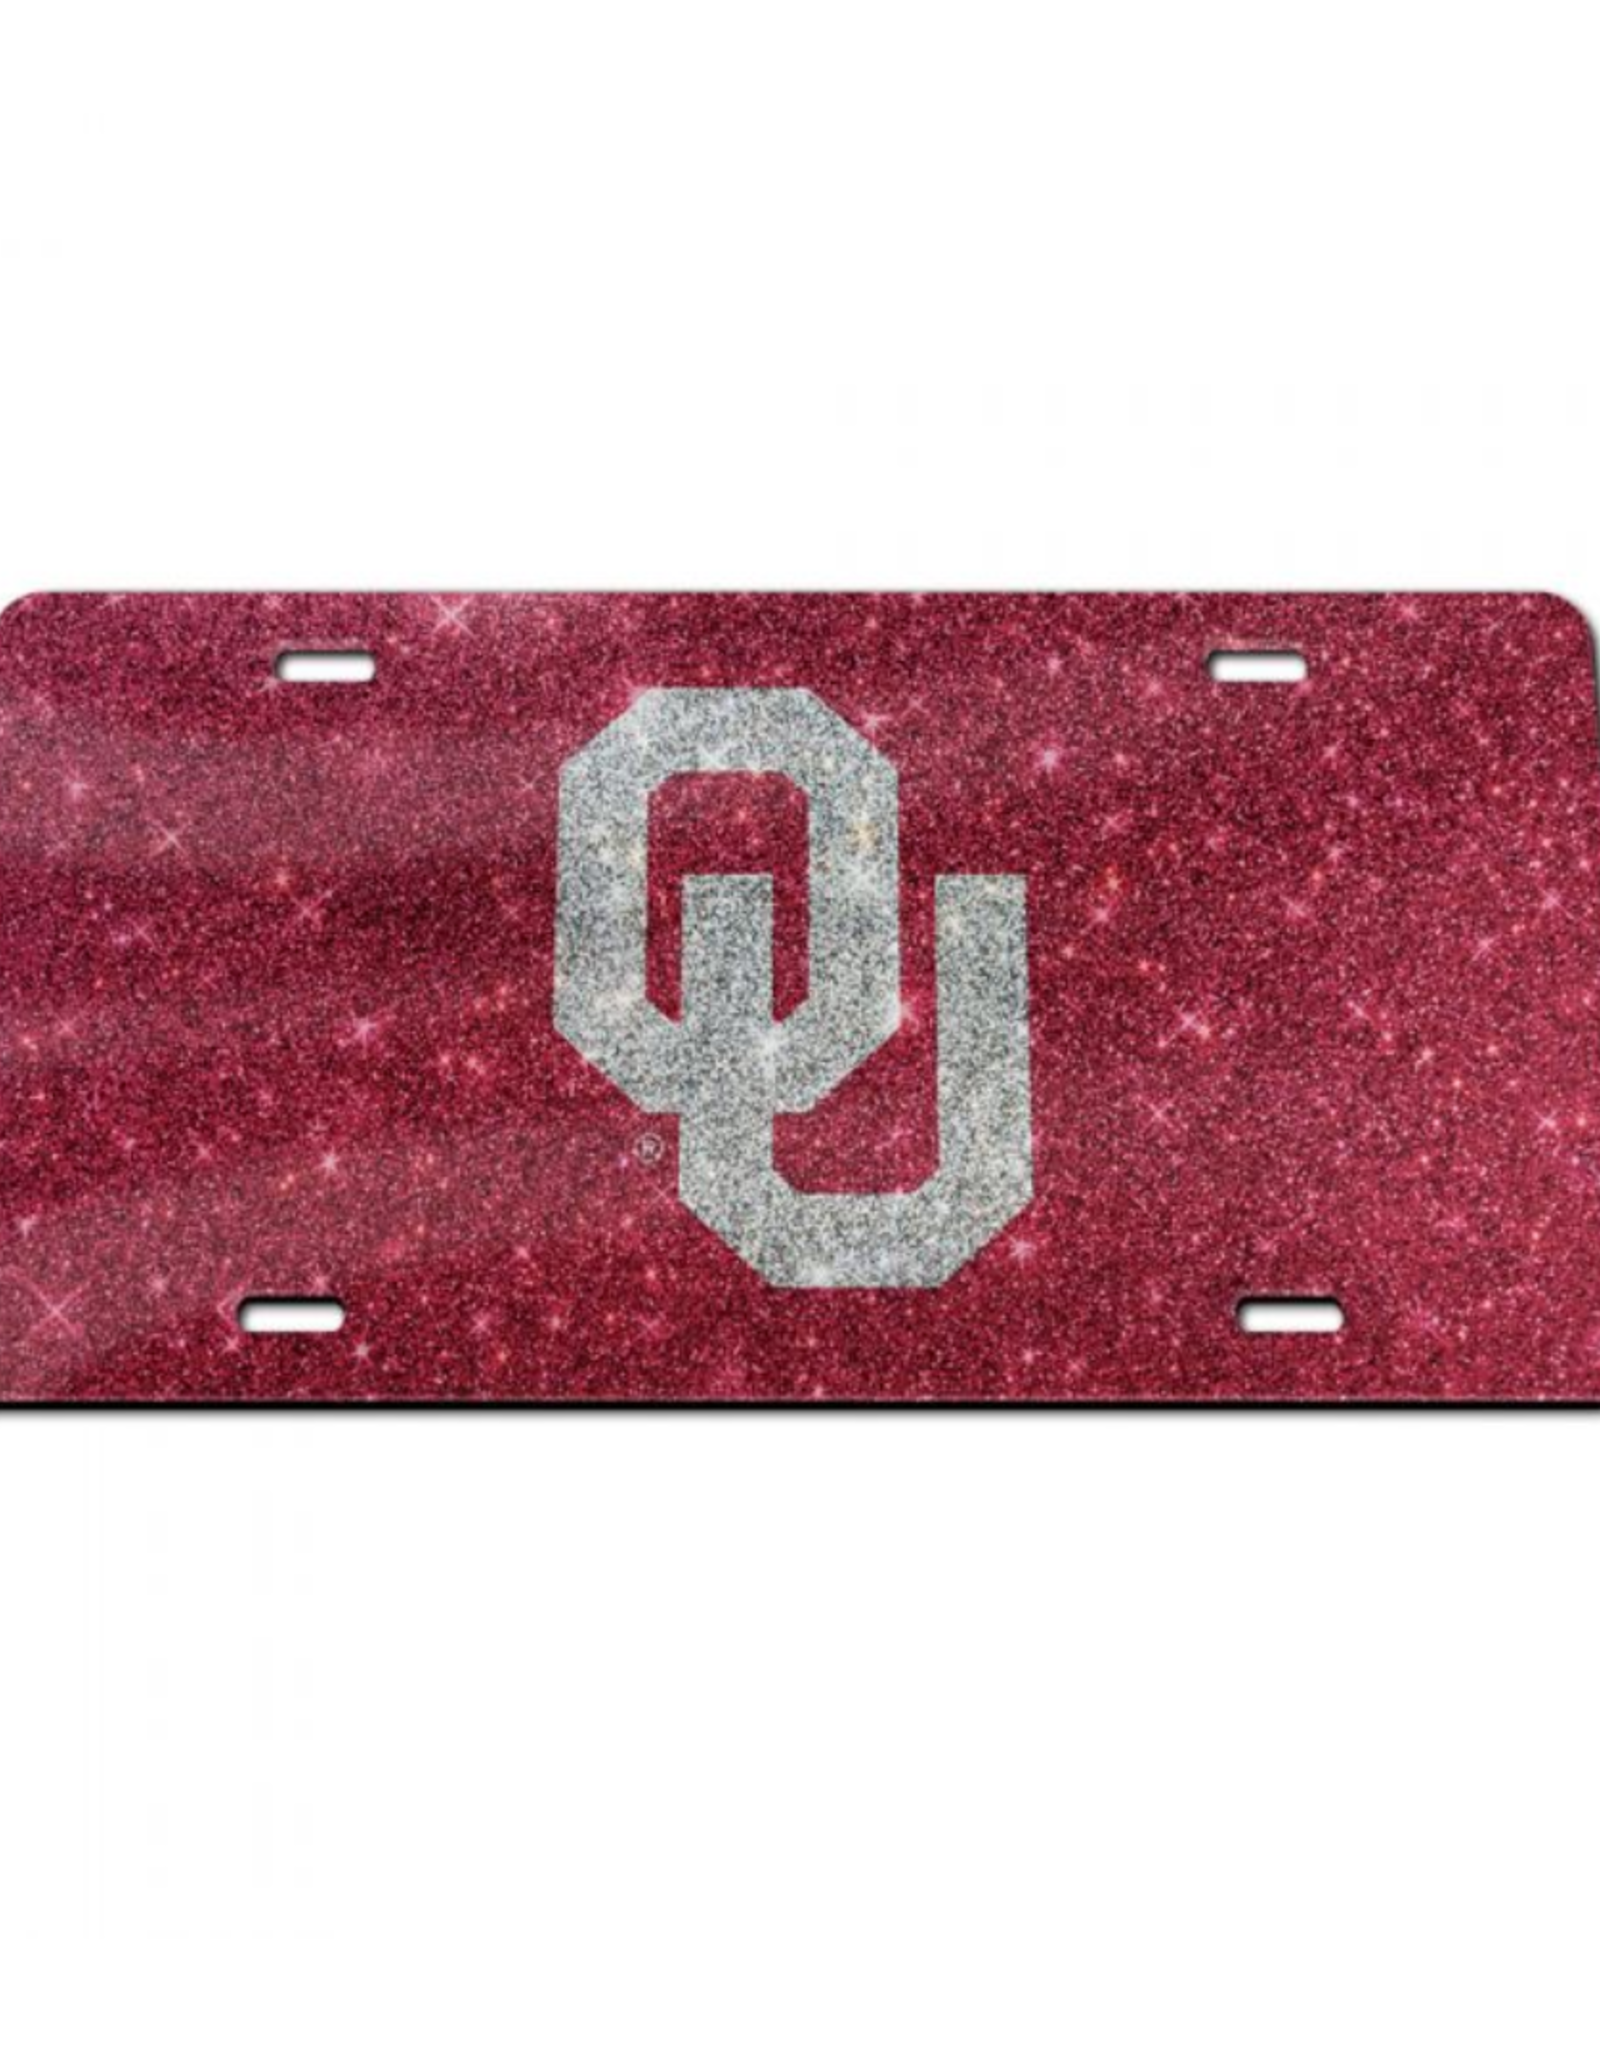 Stockdale OU Silver/Crimson Glitter License Plate